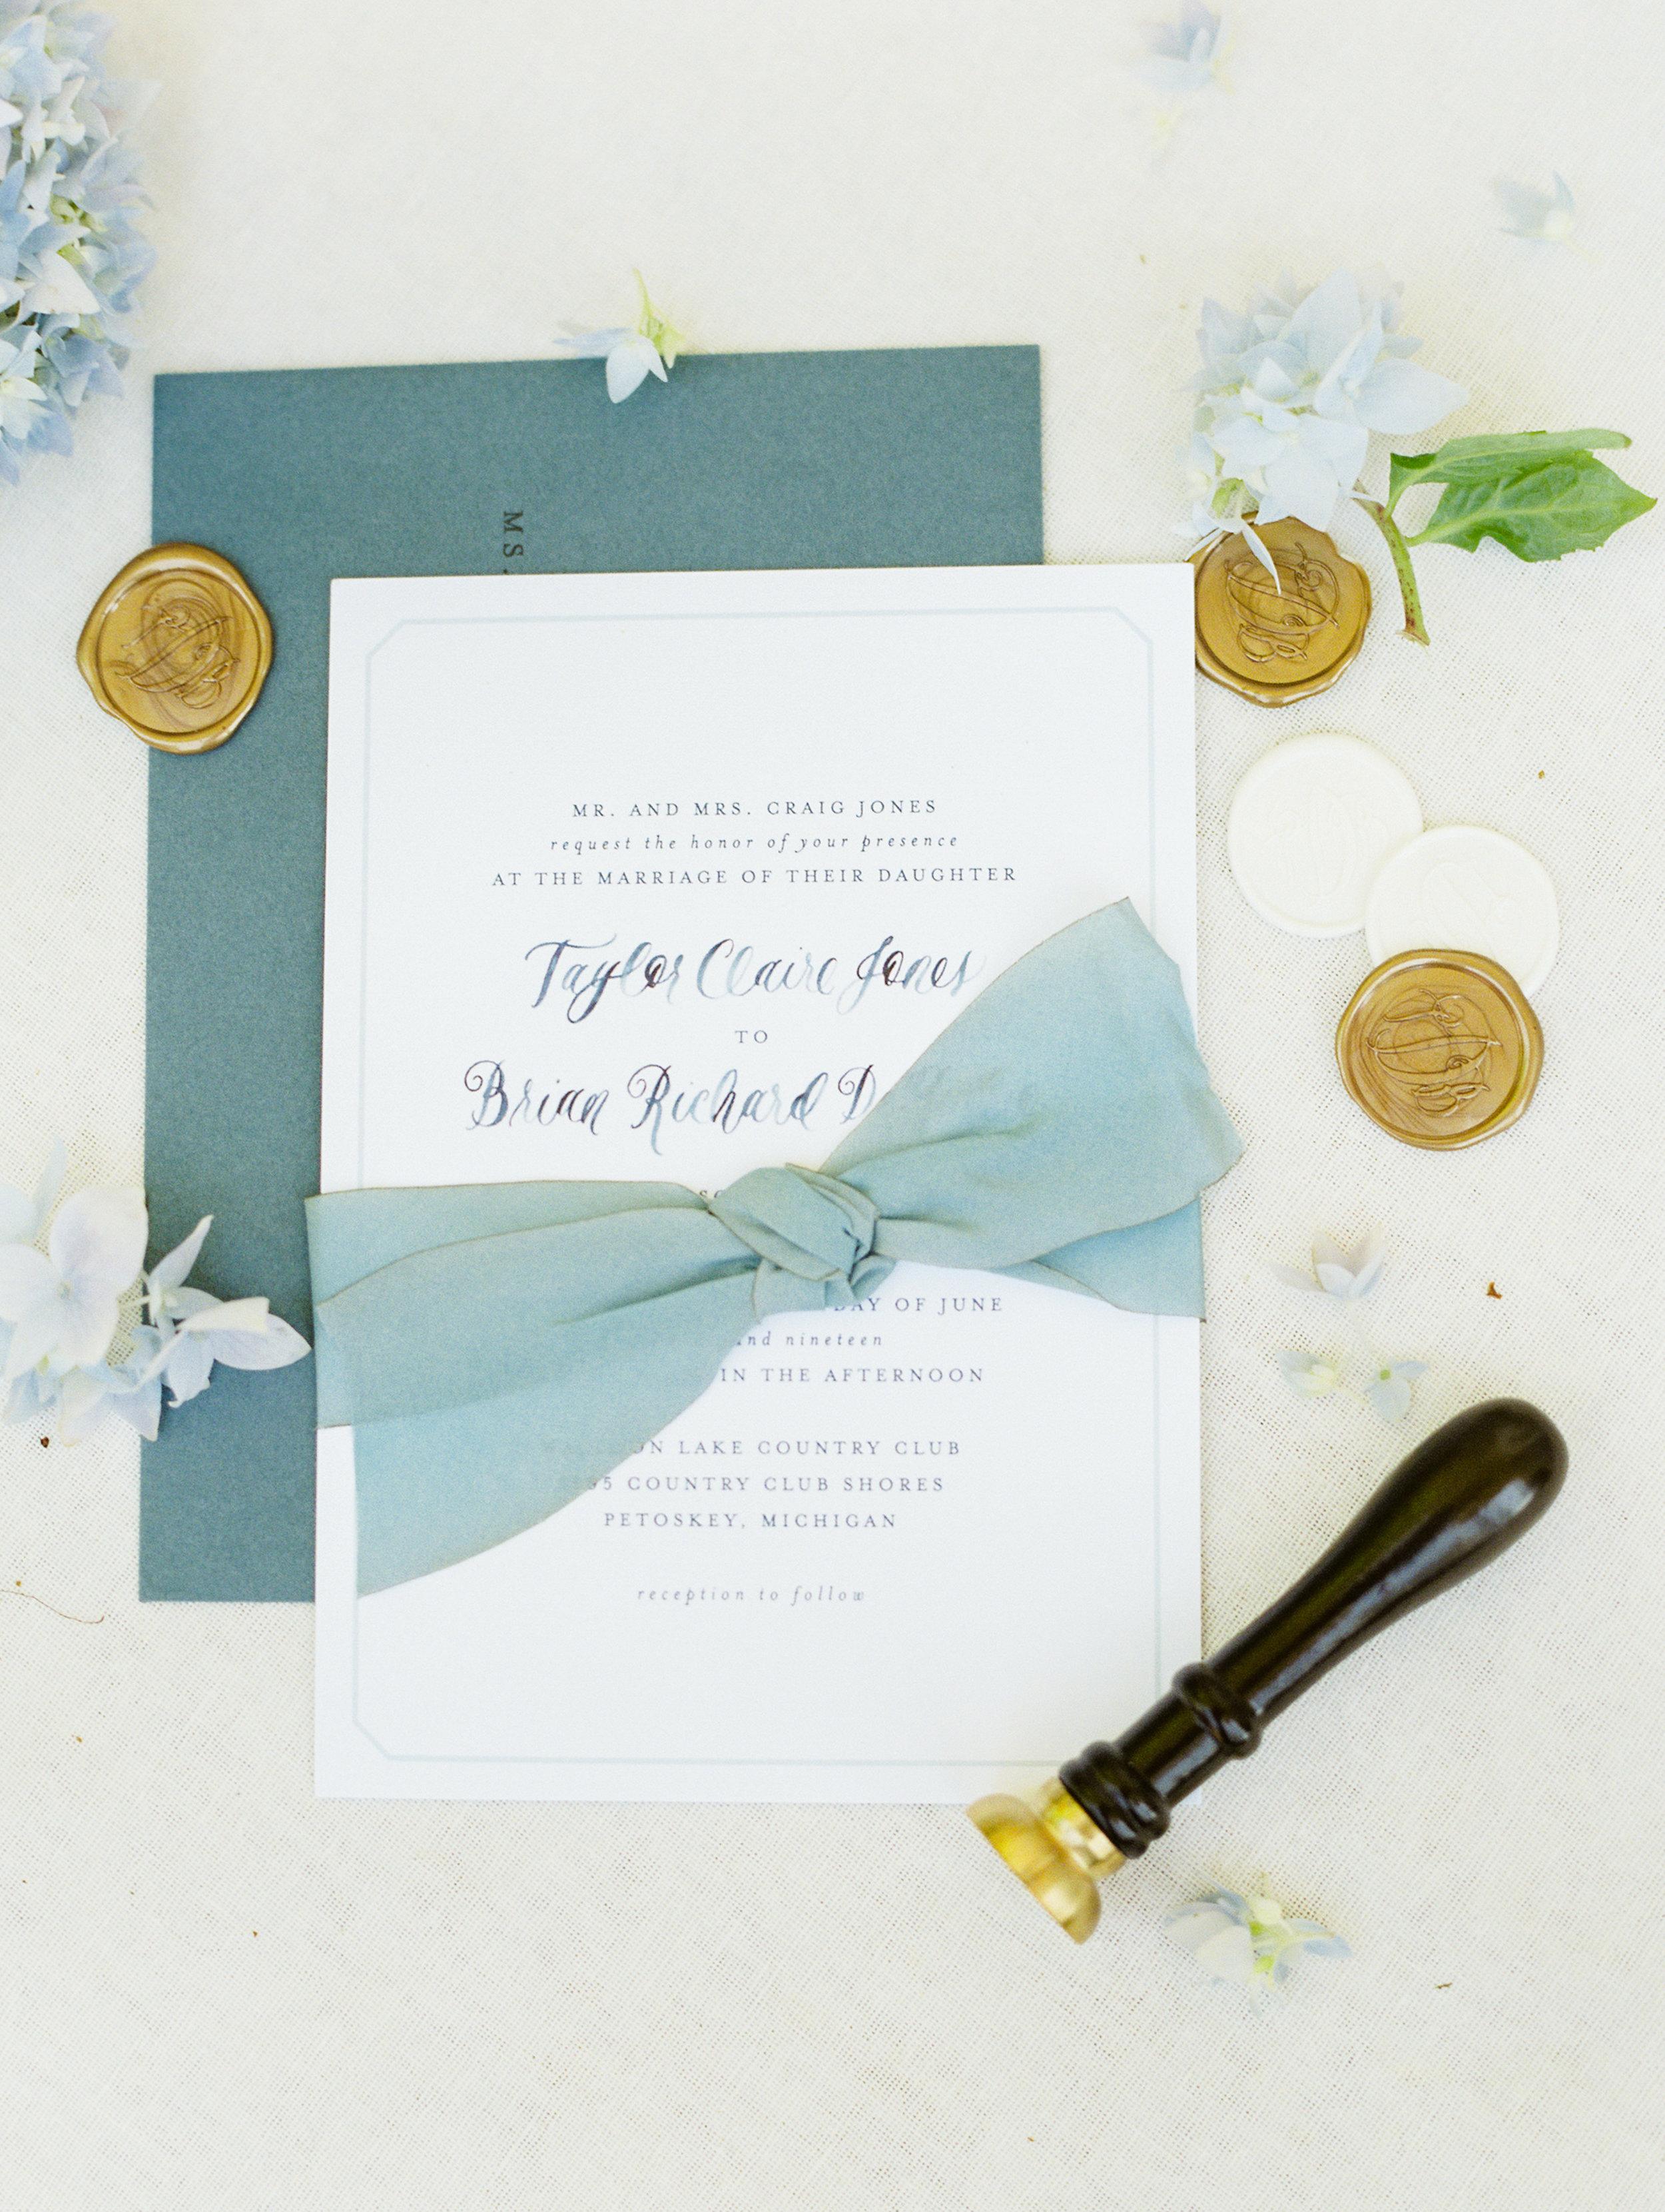 DeGuilio+Wedding+Detailsf-18 copy.jpg